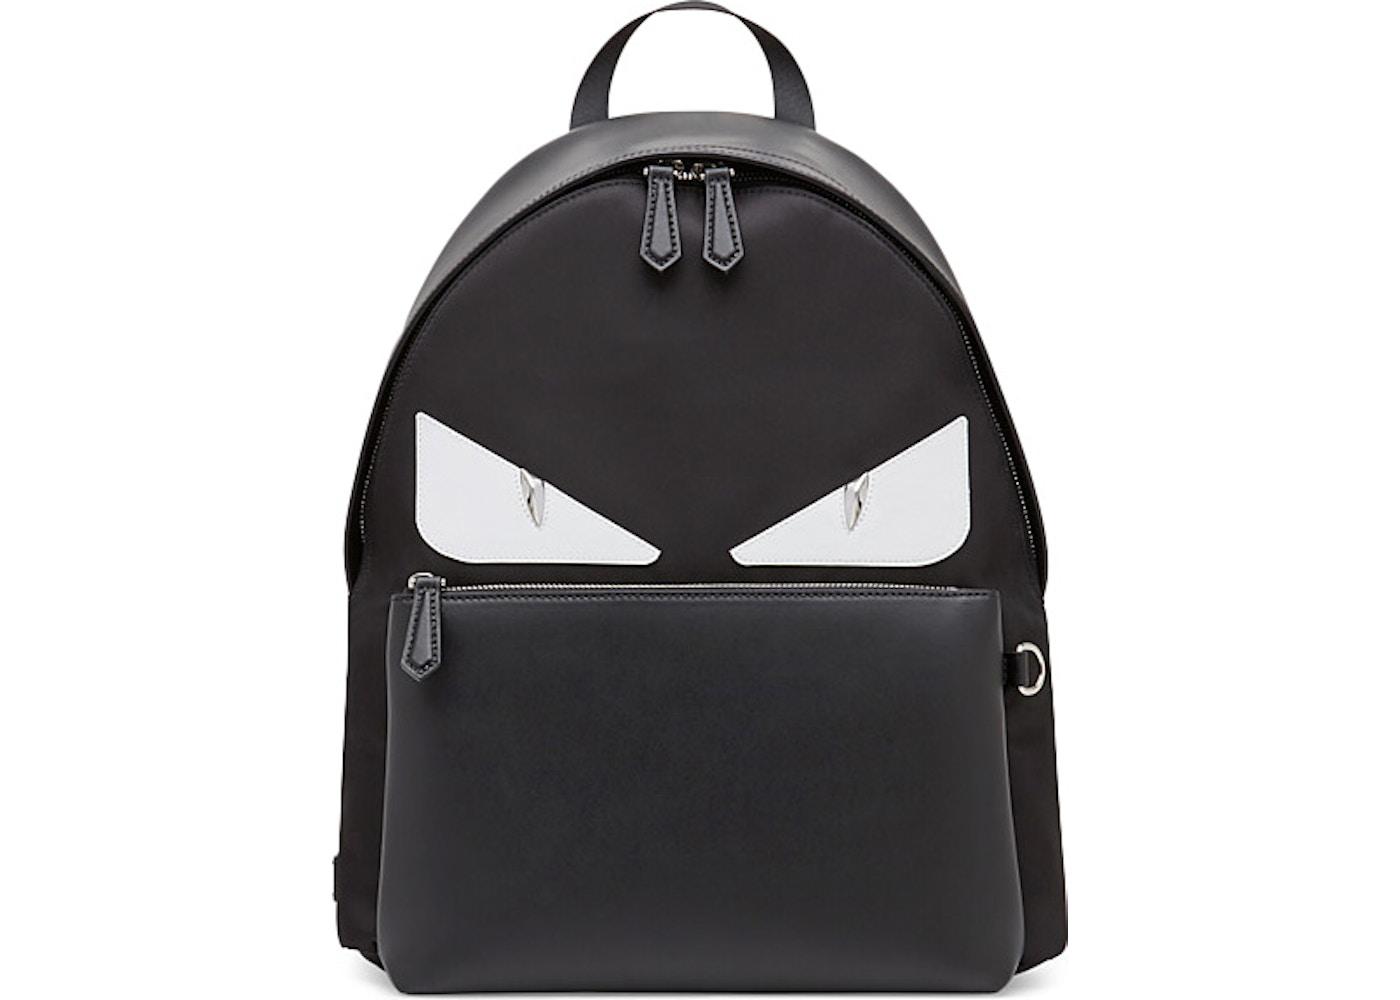 7c4241a534 Fendi Backpack Bag Bugs Eyes Black